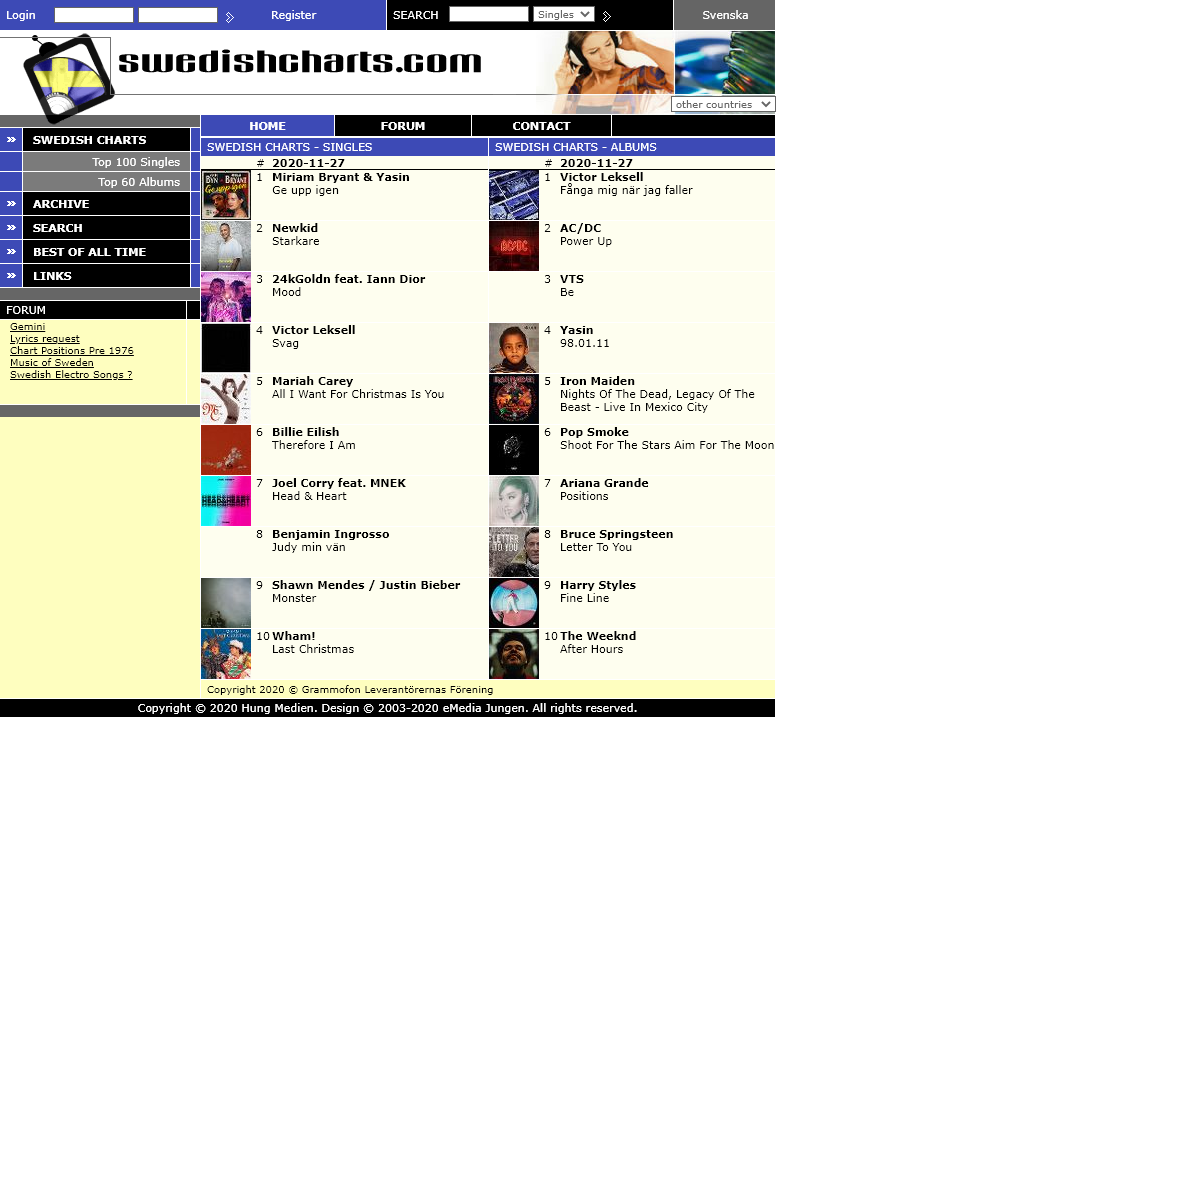 swedishcharts.com - Swedish Charts Portal